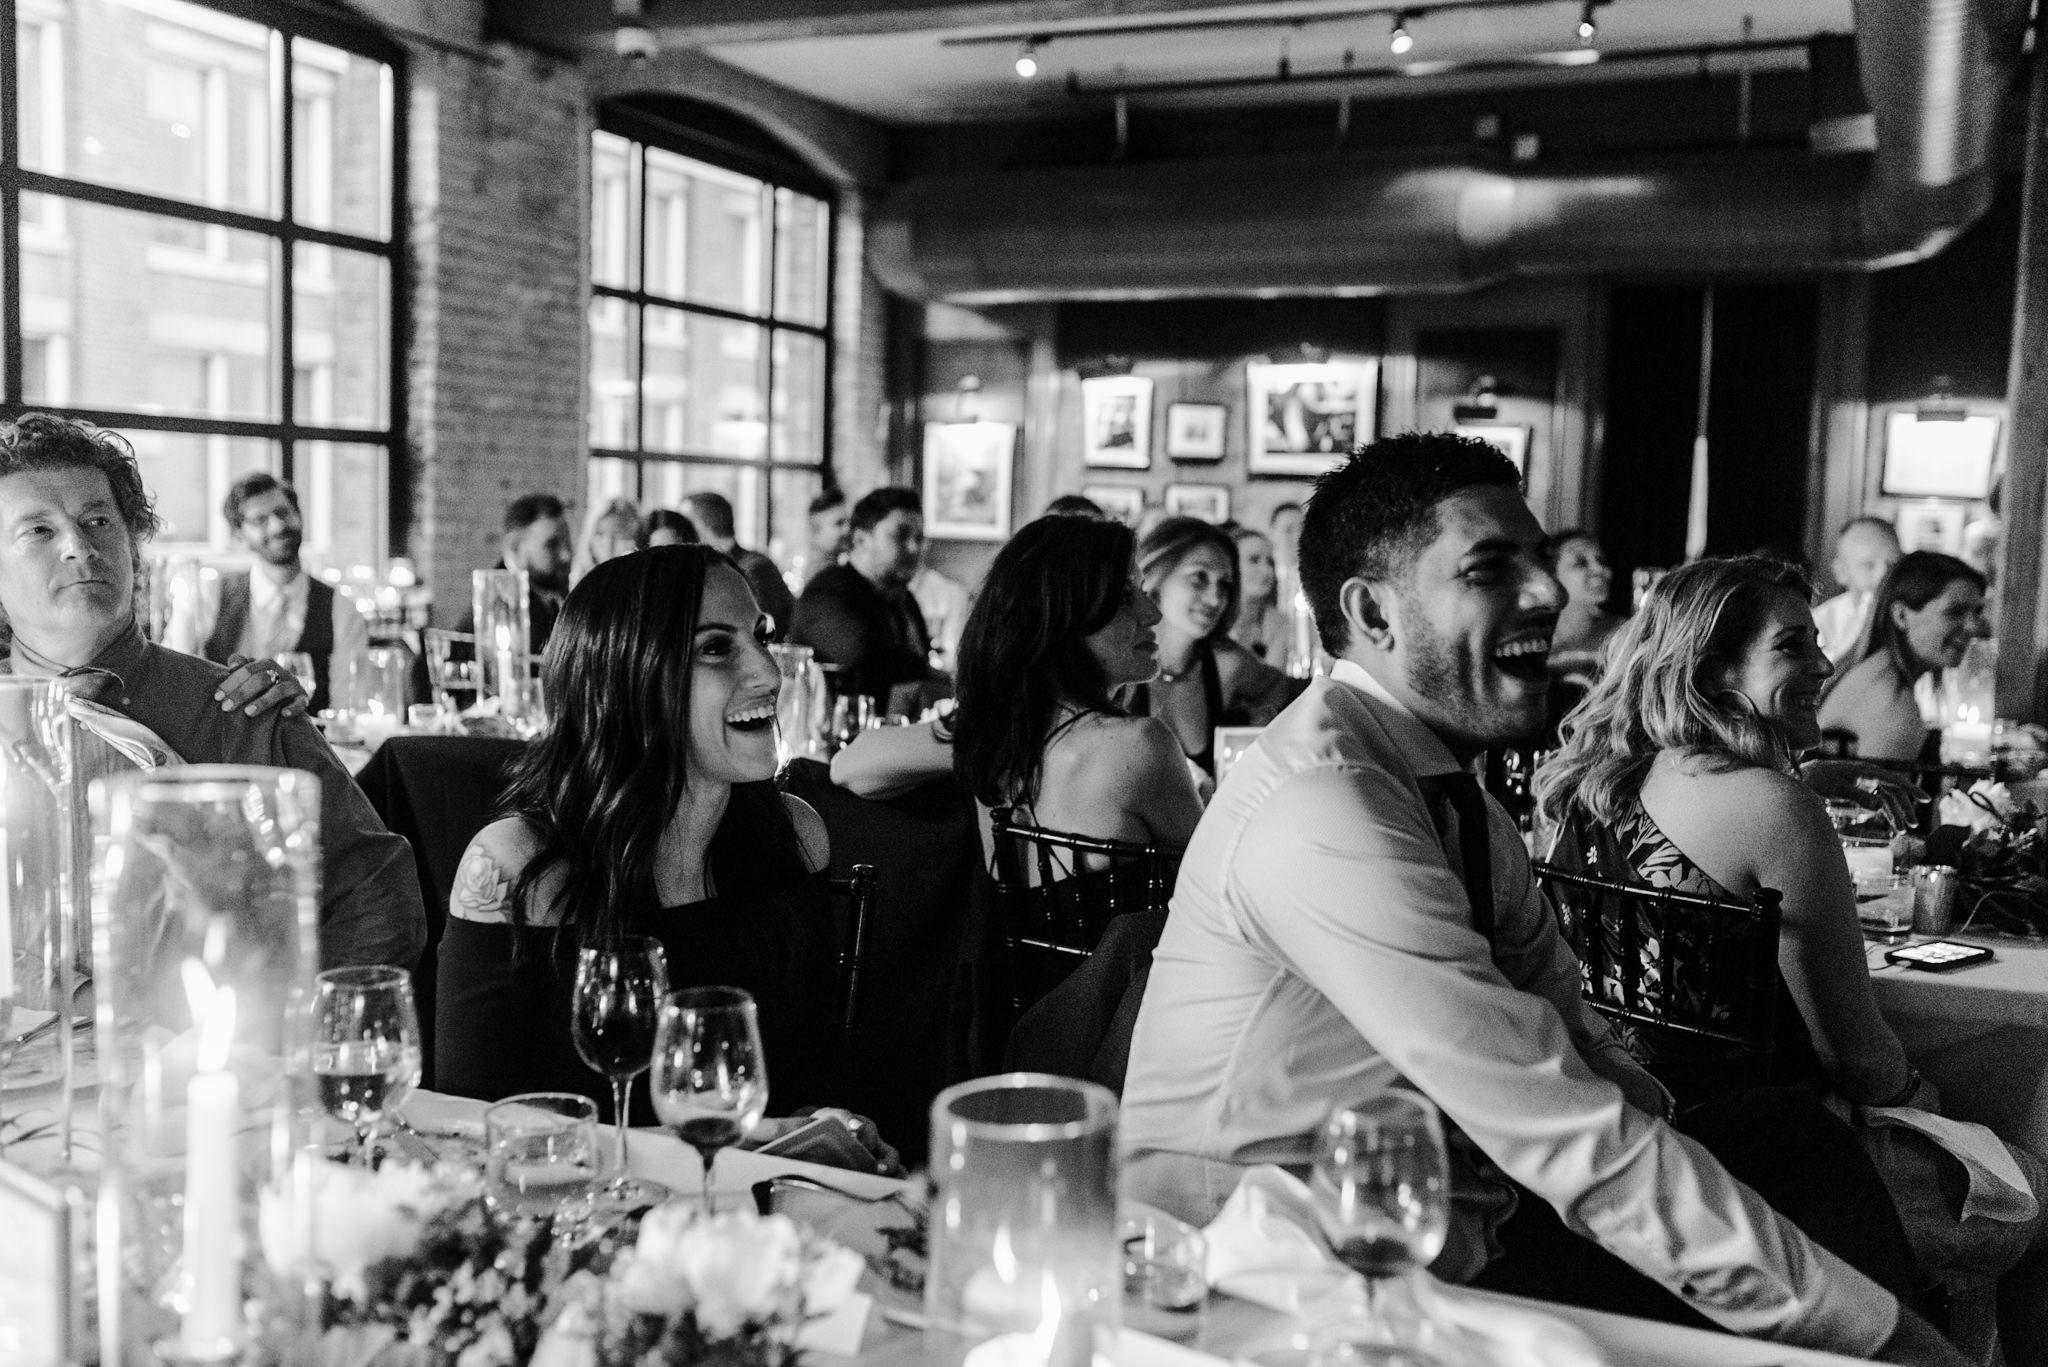 060-guests-candids-documentary-wedding-photographer-reception-storys-toronto.jpg